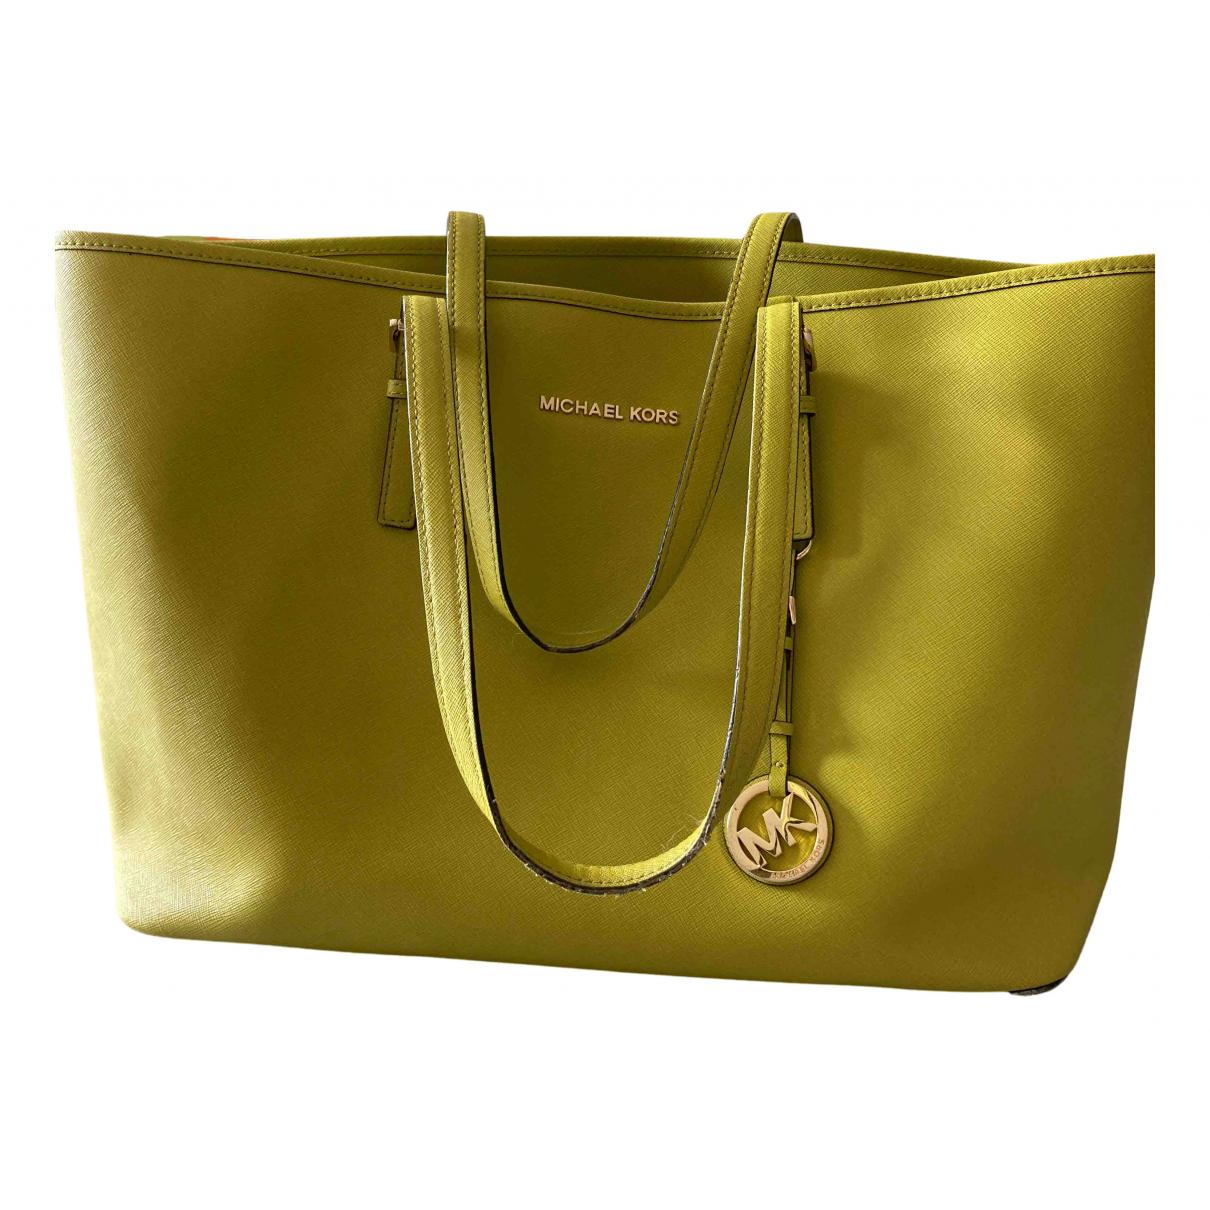 Michael Kors Jet Set Green Patent leather handbag for Women N